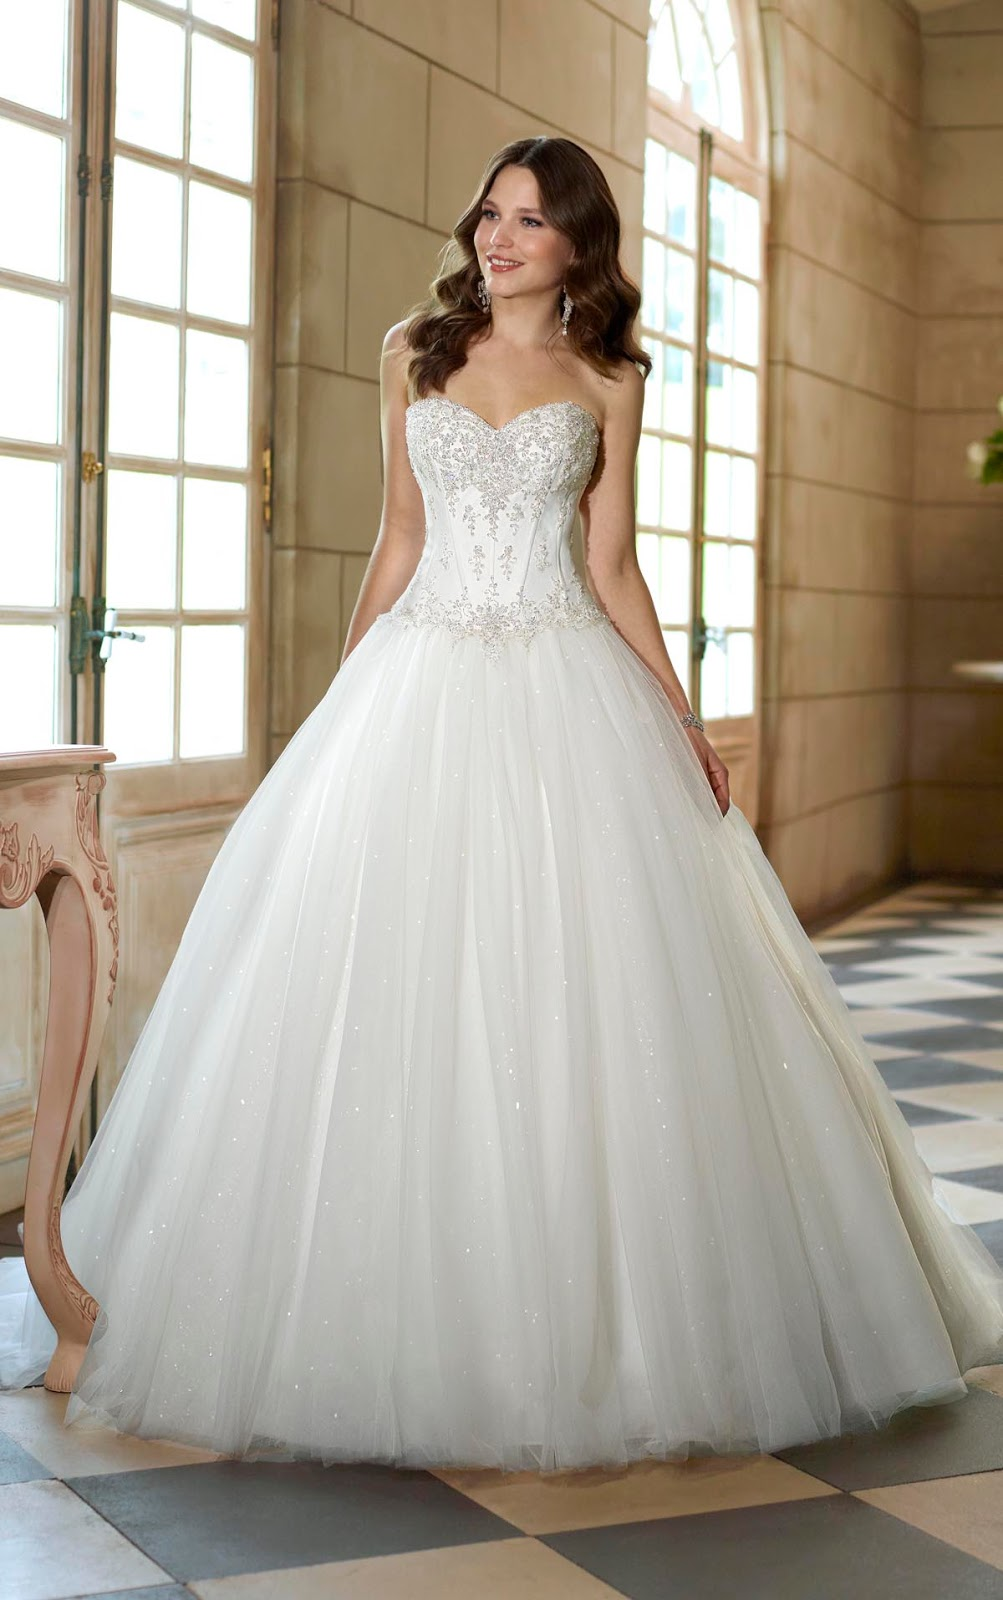 Beautiful Wedding Dress.2015 Autumn And Winter White Beautiful Wedding Dress Selection Why